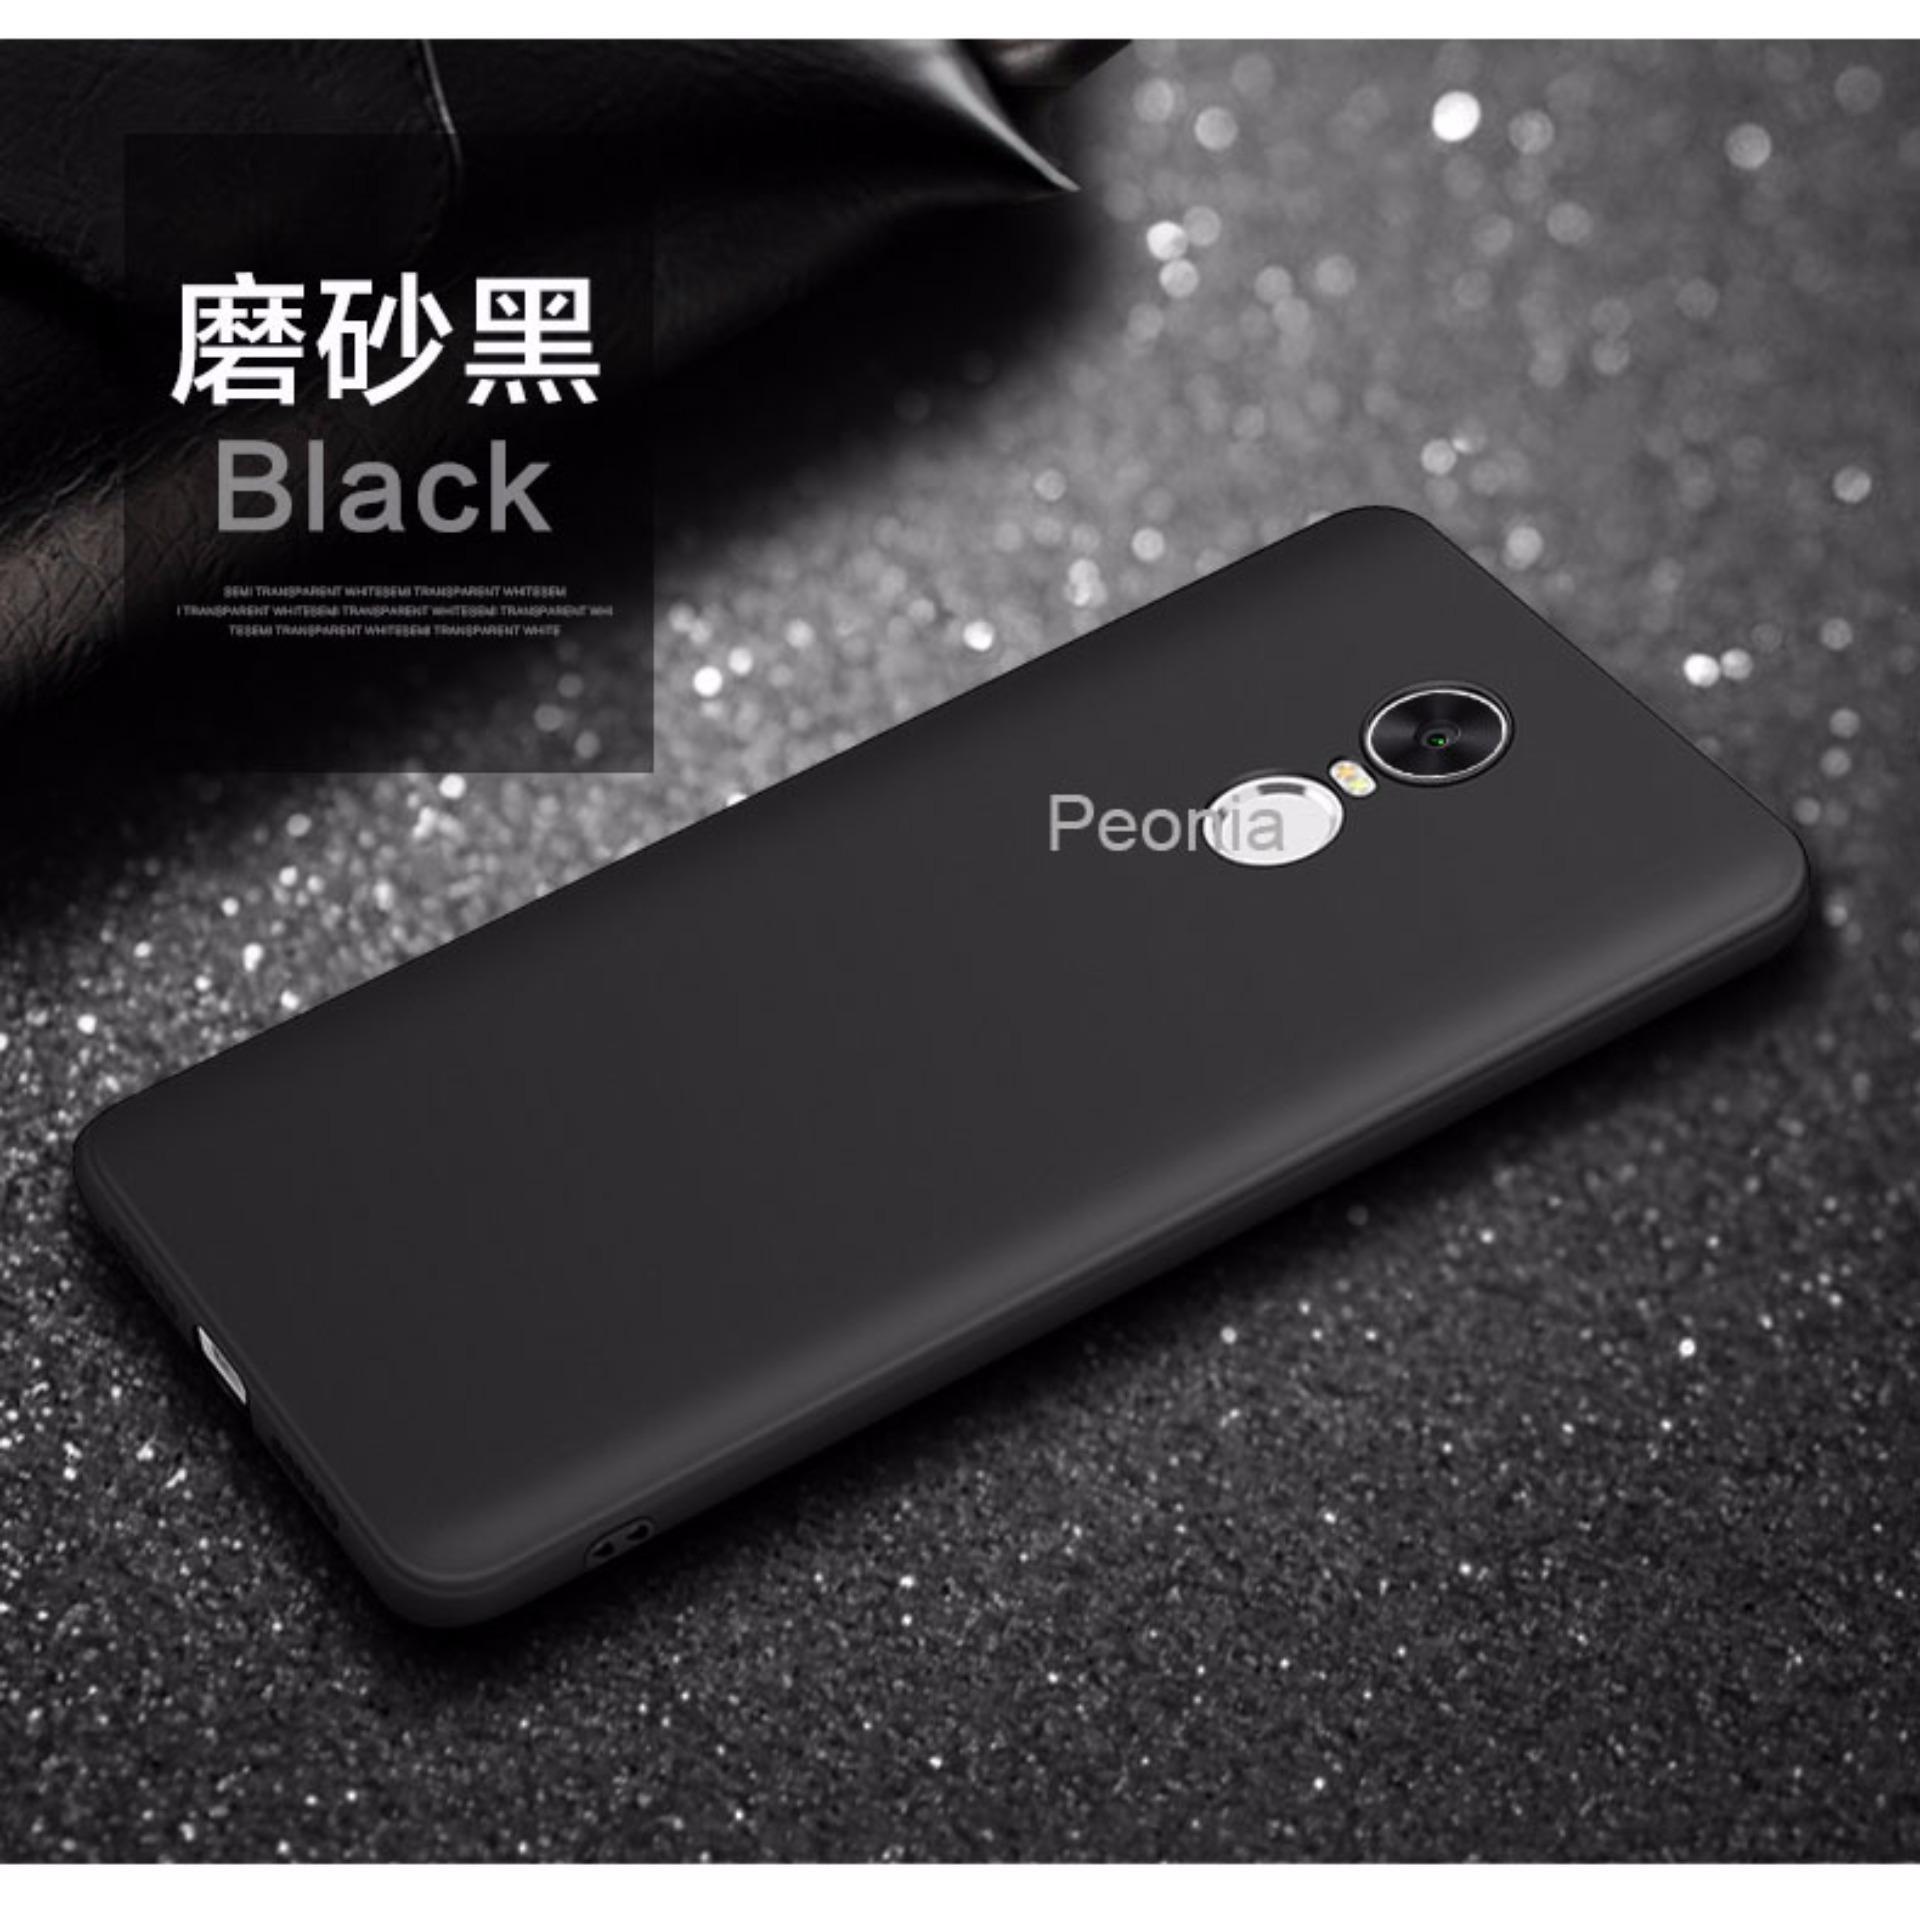 Calandiva 360 Degree Protection Case For Xiaomi Redmi Note 4x Versi Peonia Transparent Acrylic Snapdragon Tg Merah 4x4 64gbsnapdragon Version Fit This Item